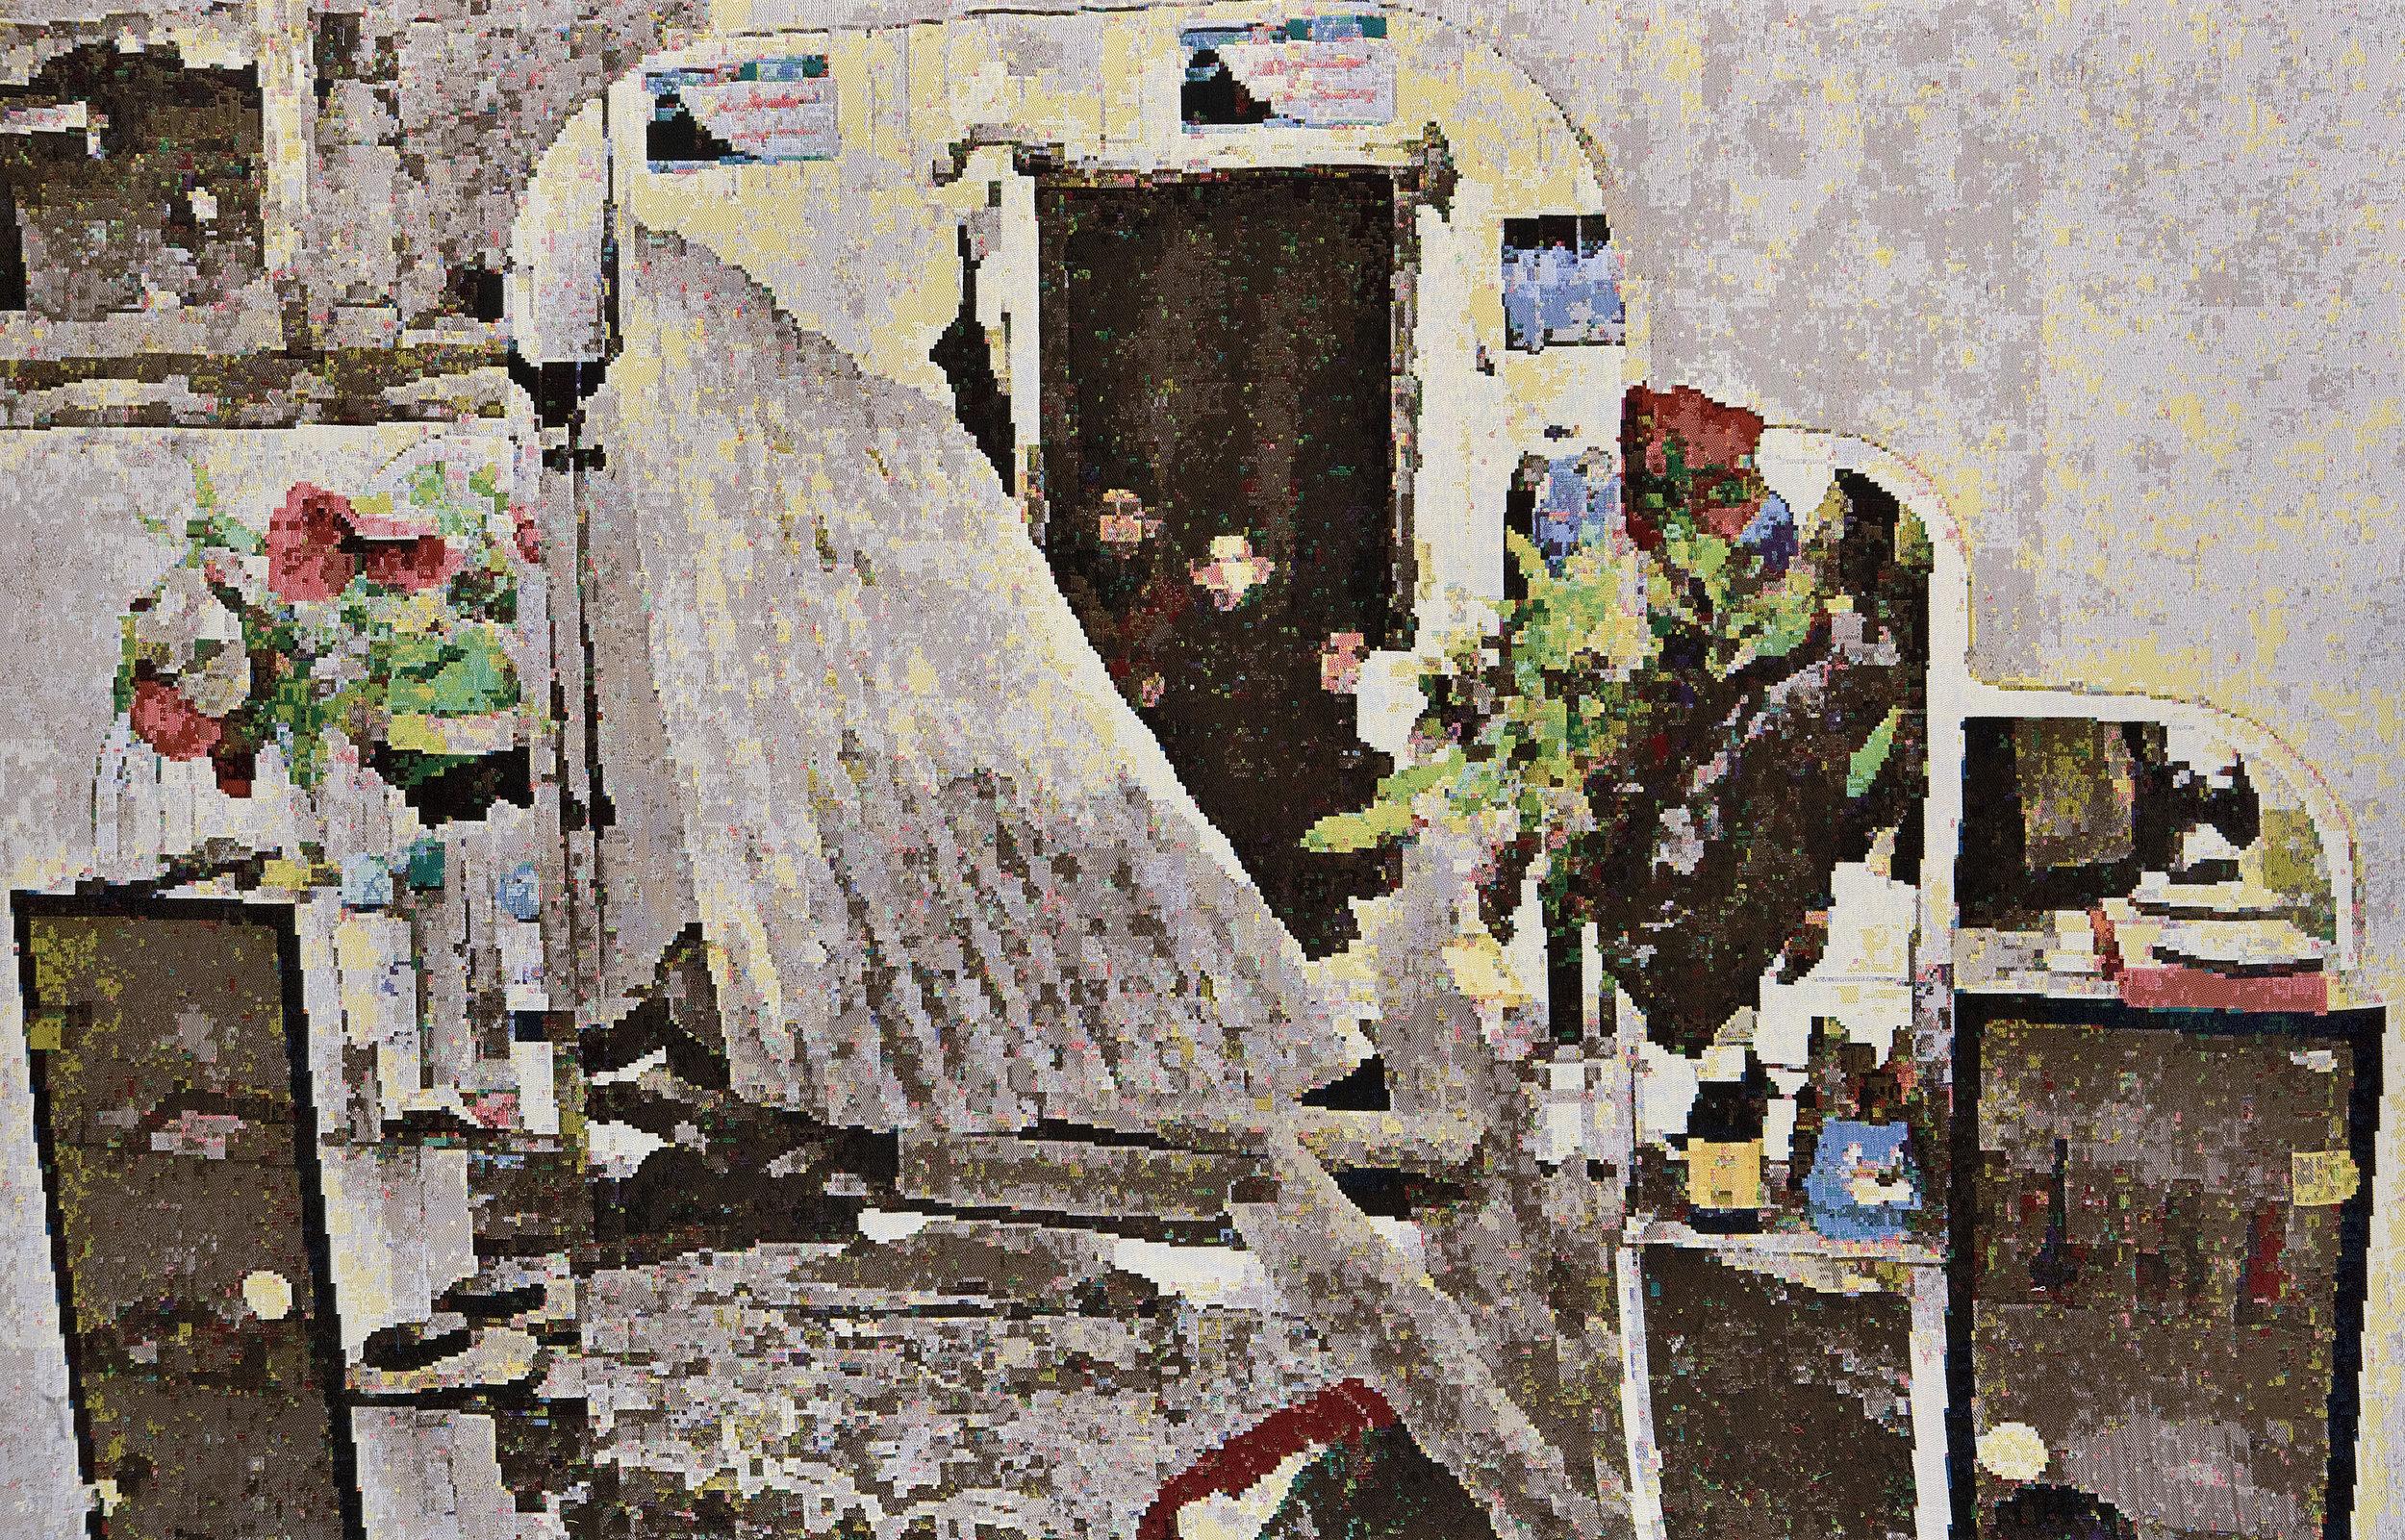 Faith 2009: Gaza I, Jacquard woven, 149 x 231 cm